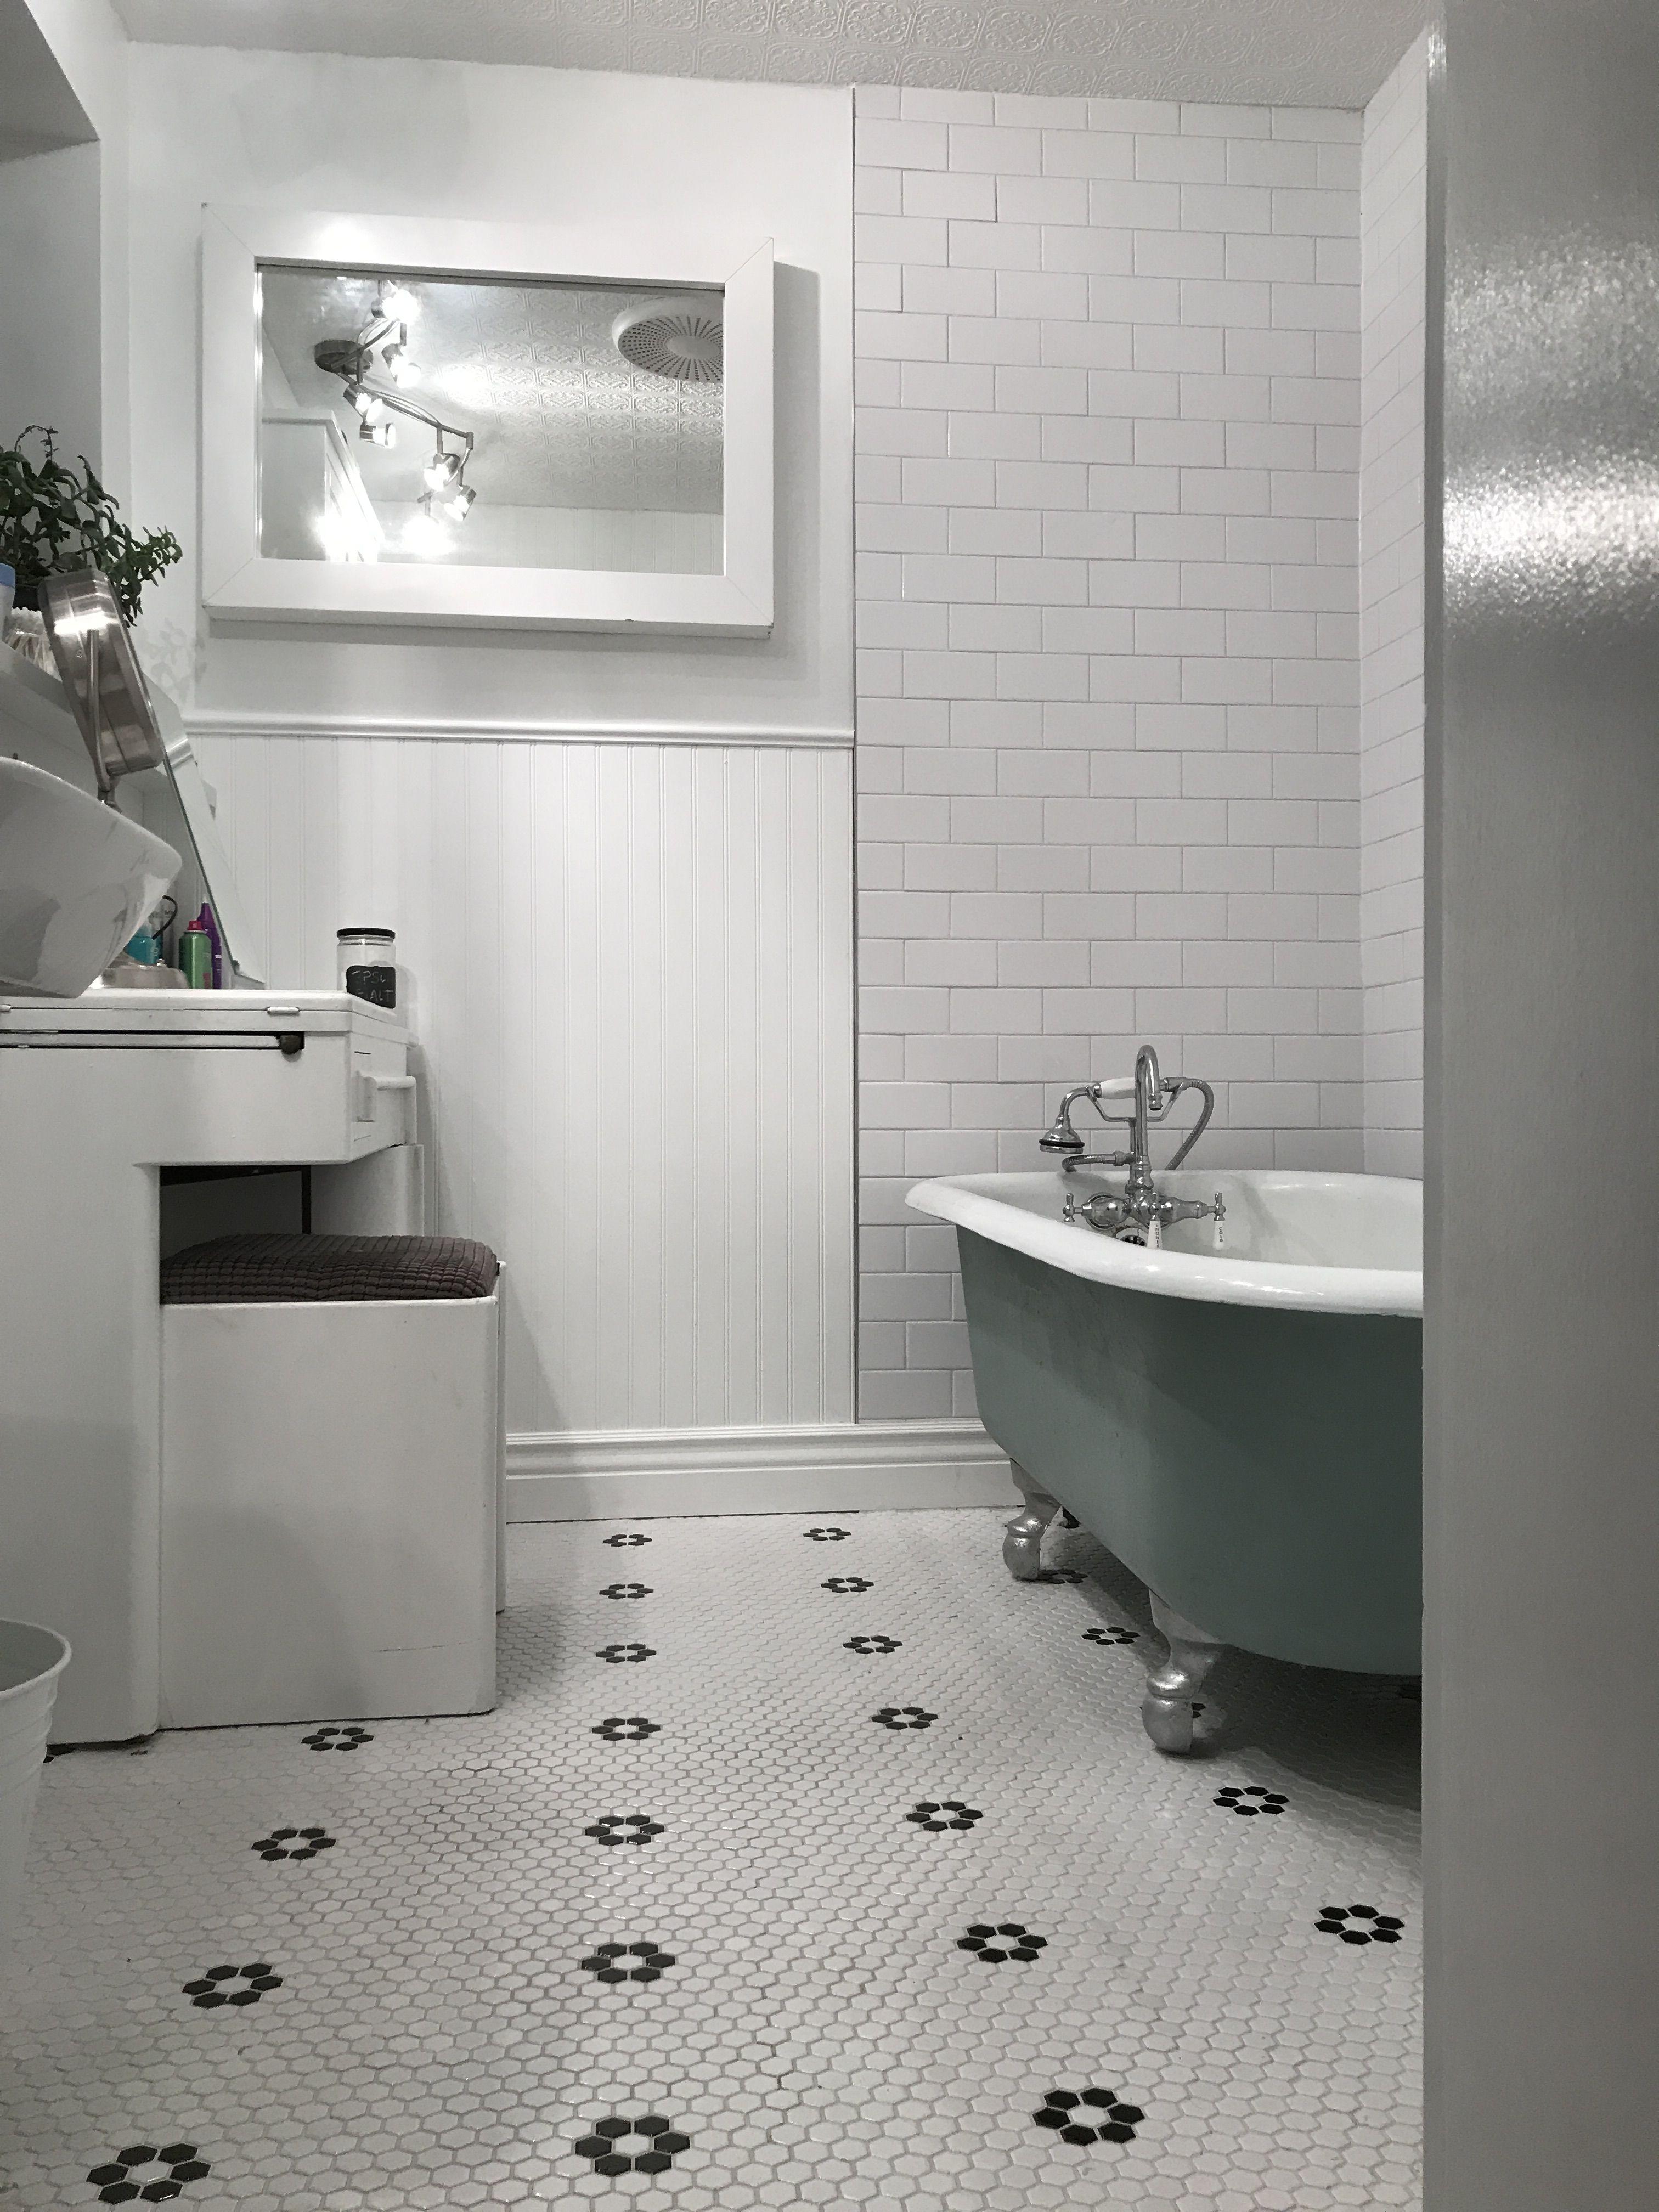 Claw Foot Tub, Bathroom Remodel, Hex Tile, Bead Board, Textured